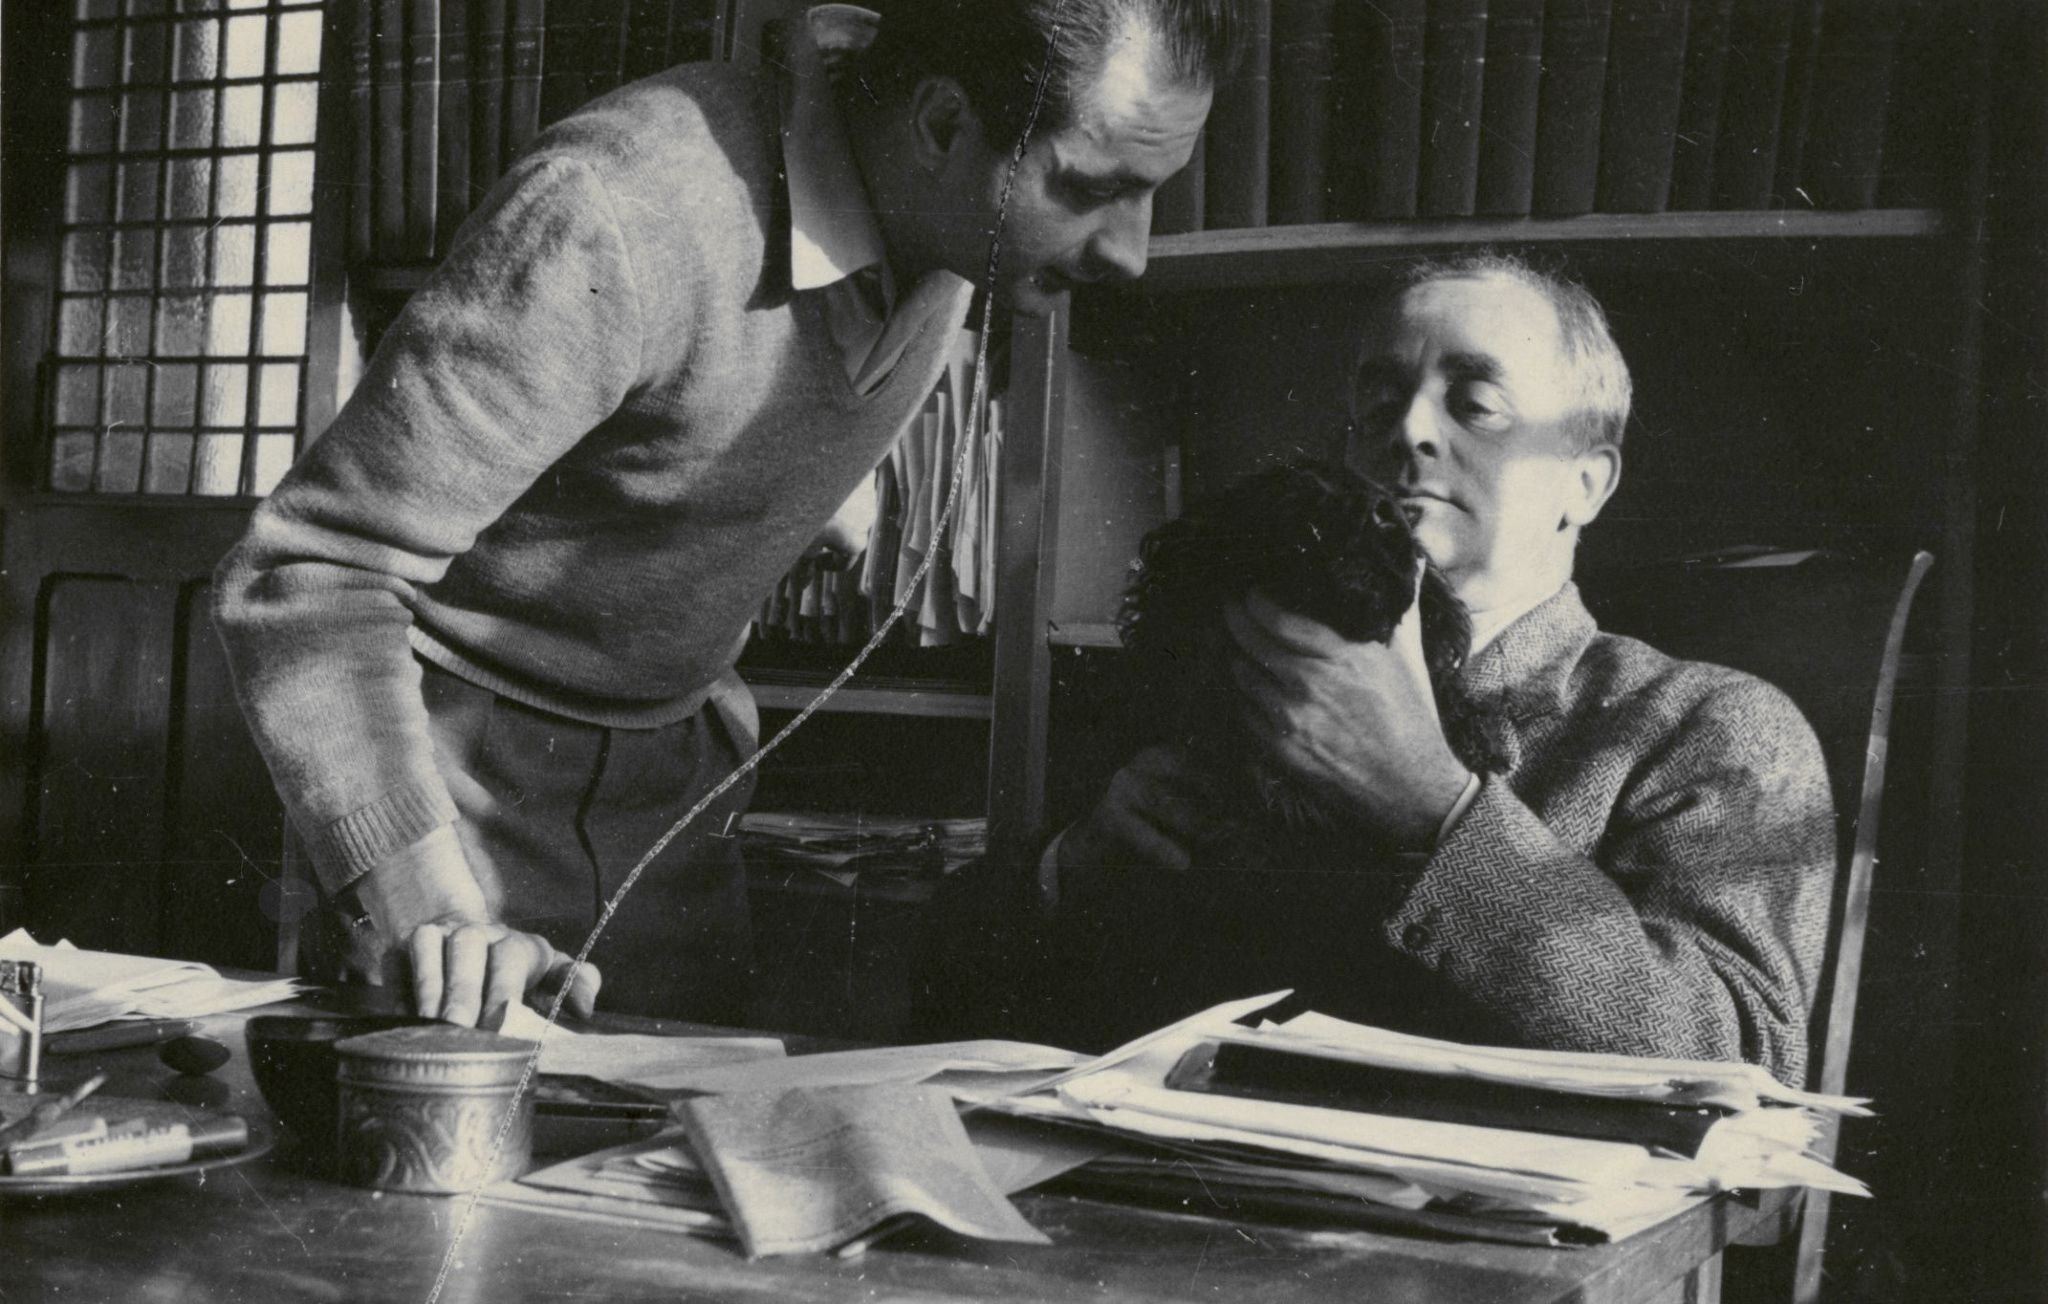 <div class='inner-box'><div class='close-desc'></div>  <span class='opis'>Henryk Giedroyc i Jerzy Giedroyc, z psem Blackiem. Maisons-Laffitte, 1955.</span>   </div>